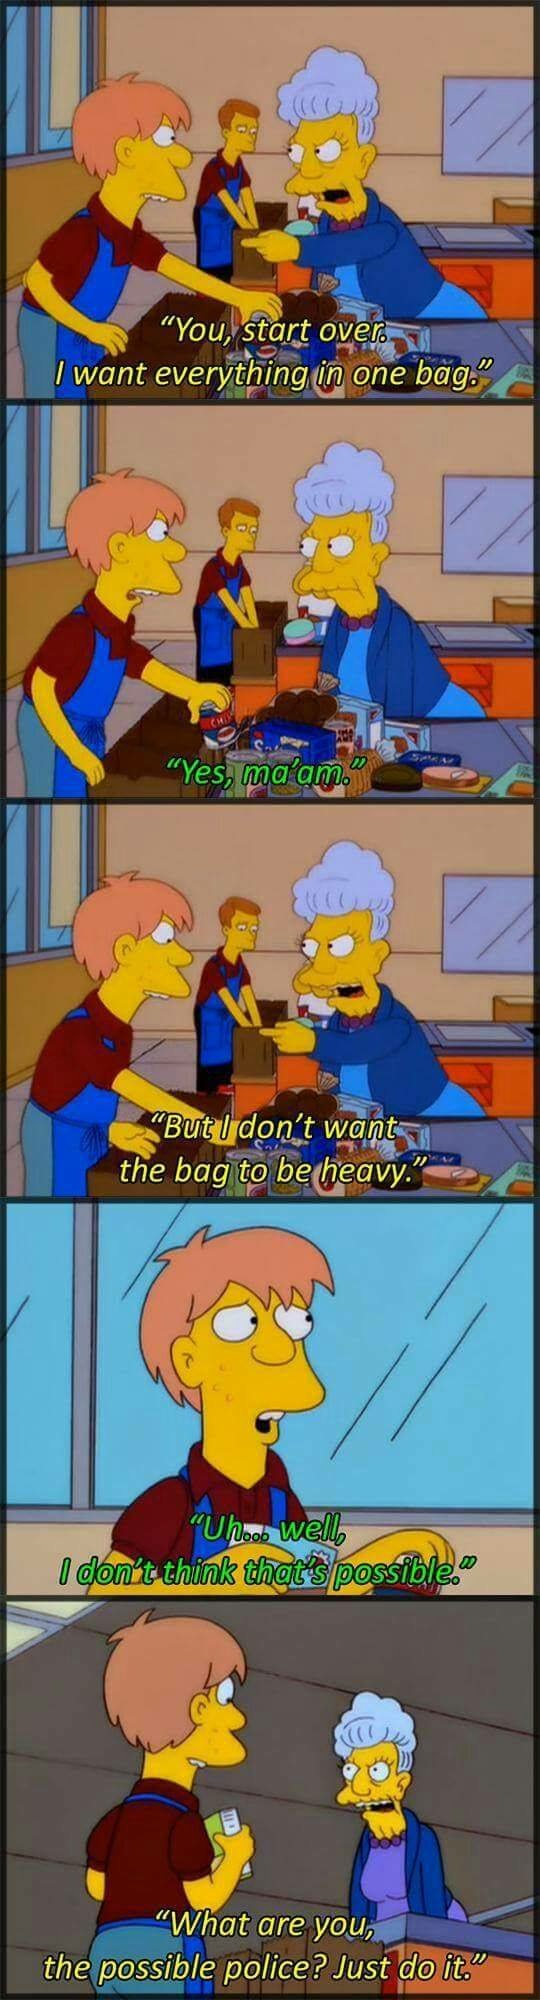 The Simpsons The Simpsons Simpsons funny, The simpsons